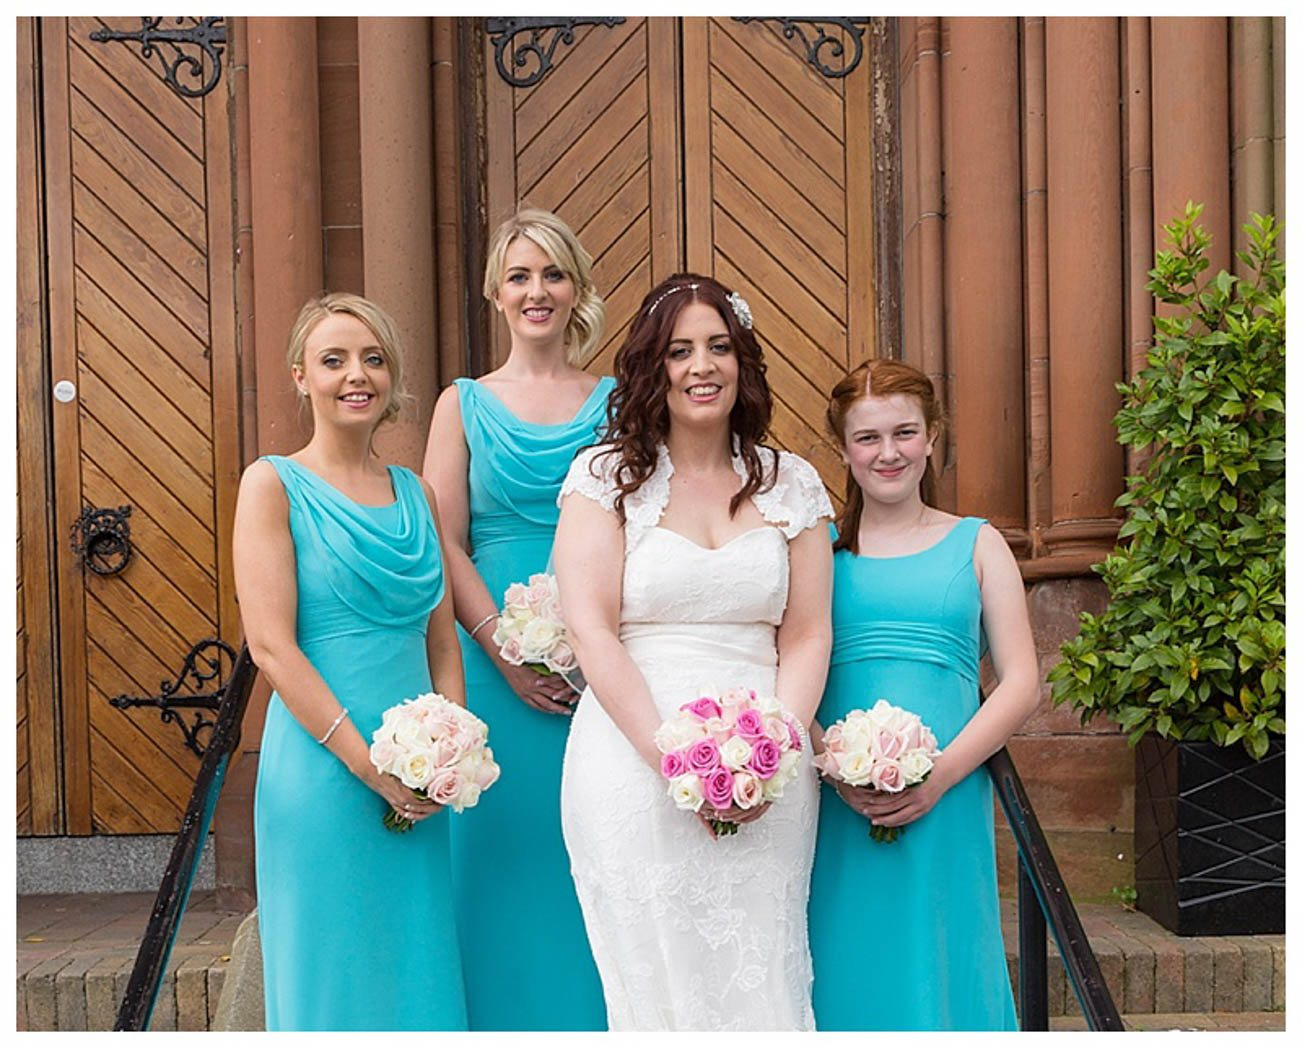 Ballygally Castle Wedding Photographs by Ricky Parker Photography-18